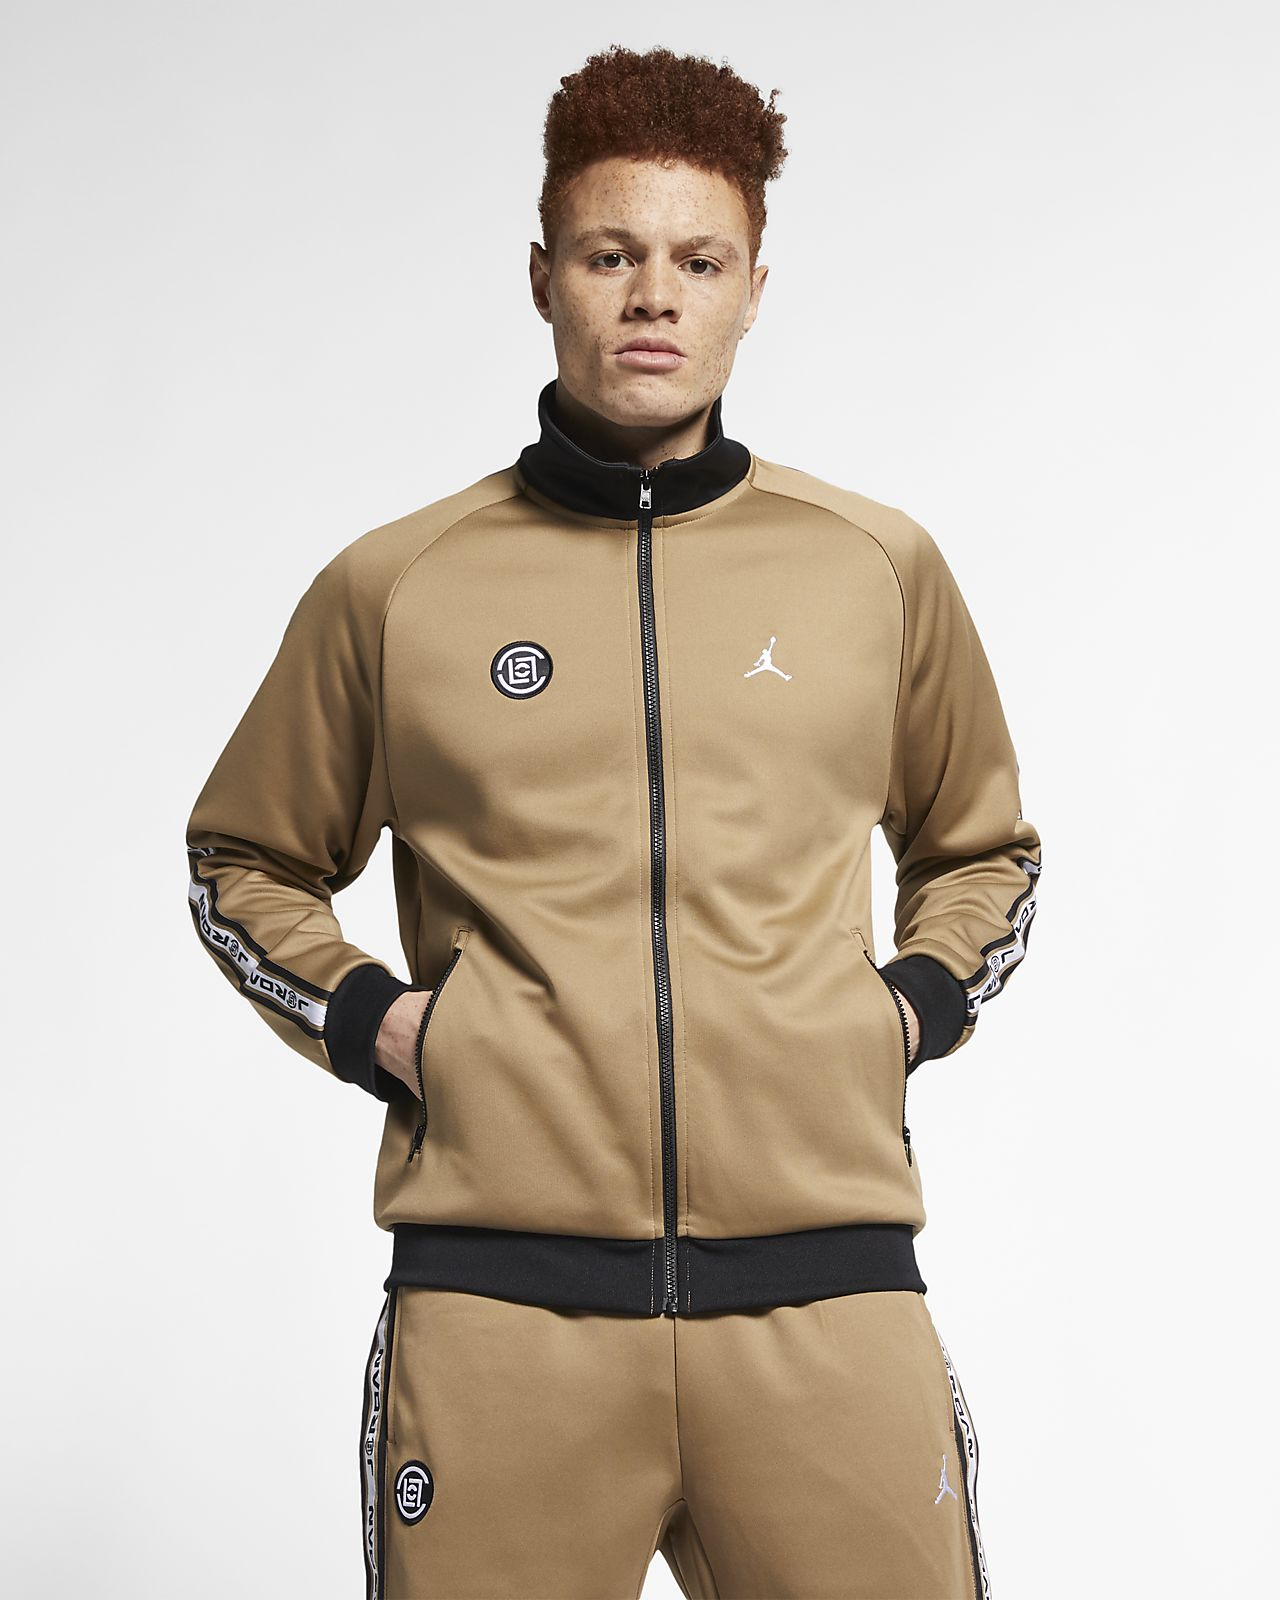 ceae4000354e12 Jordan x CLOT Men s Tricot Jacket. Nike.com PT